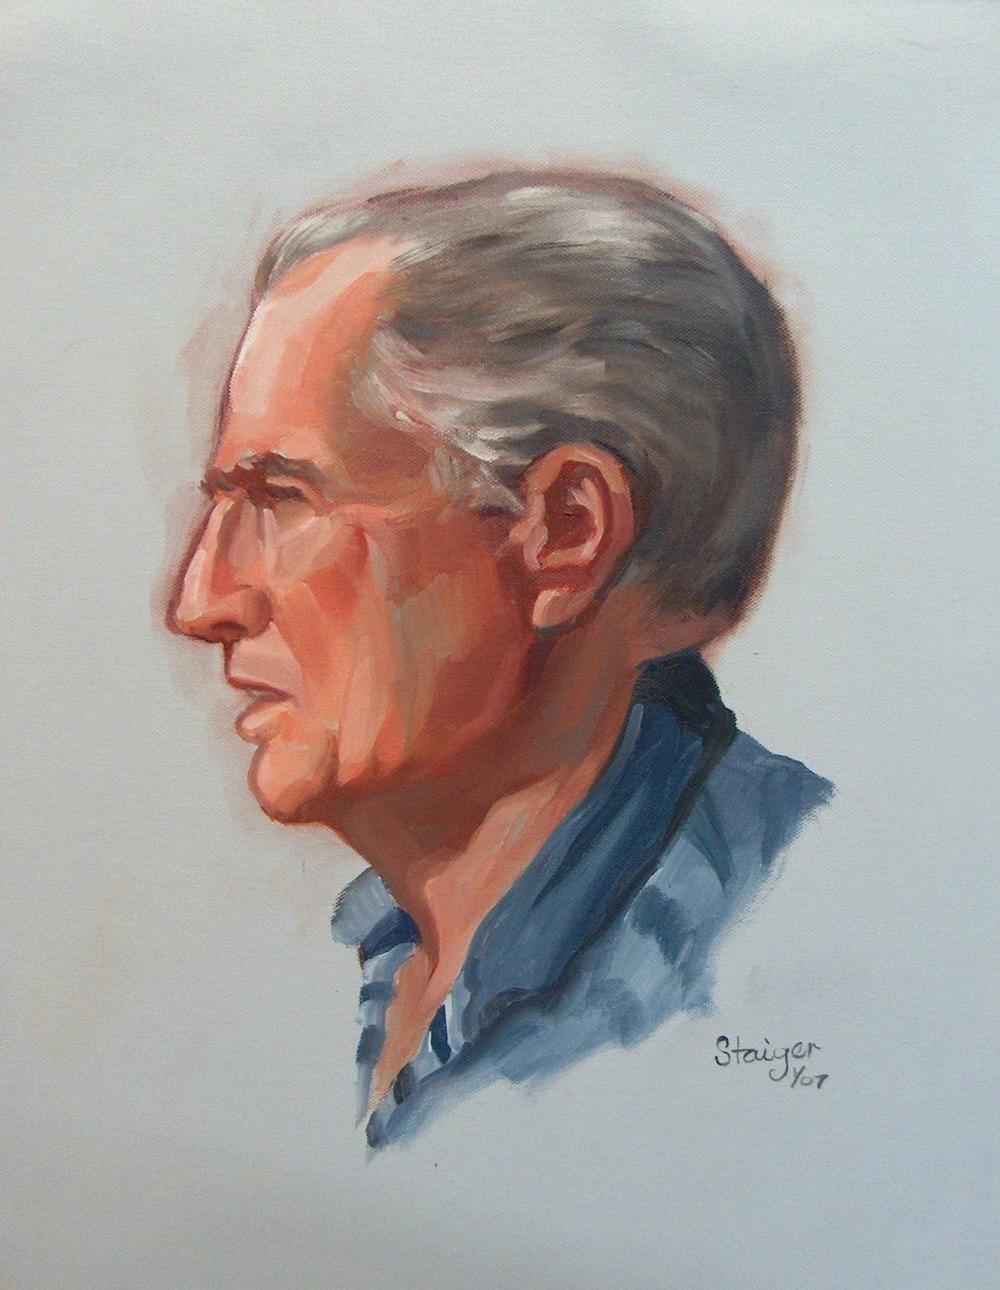 Bill (sketch) NFS